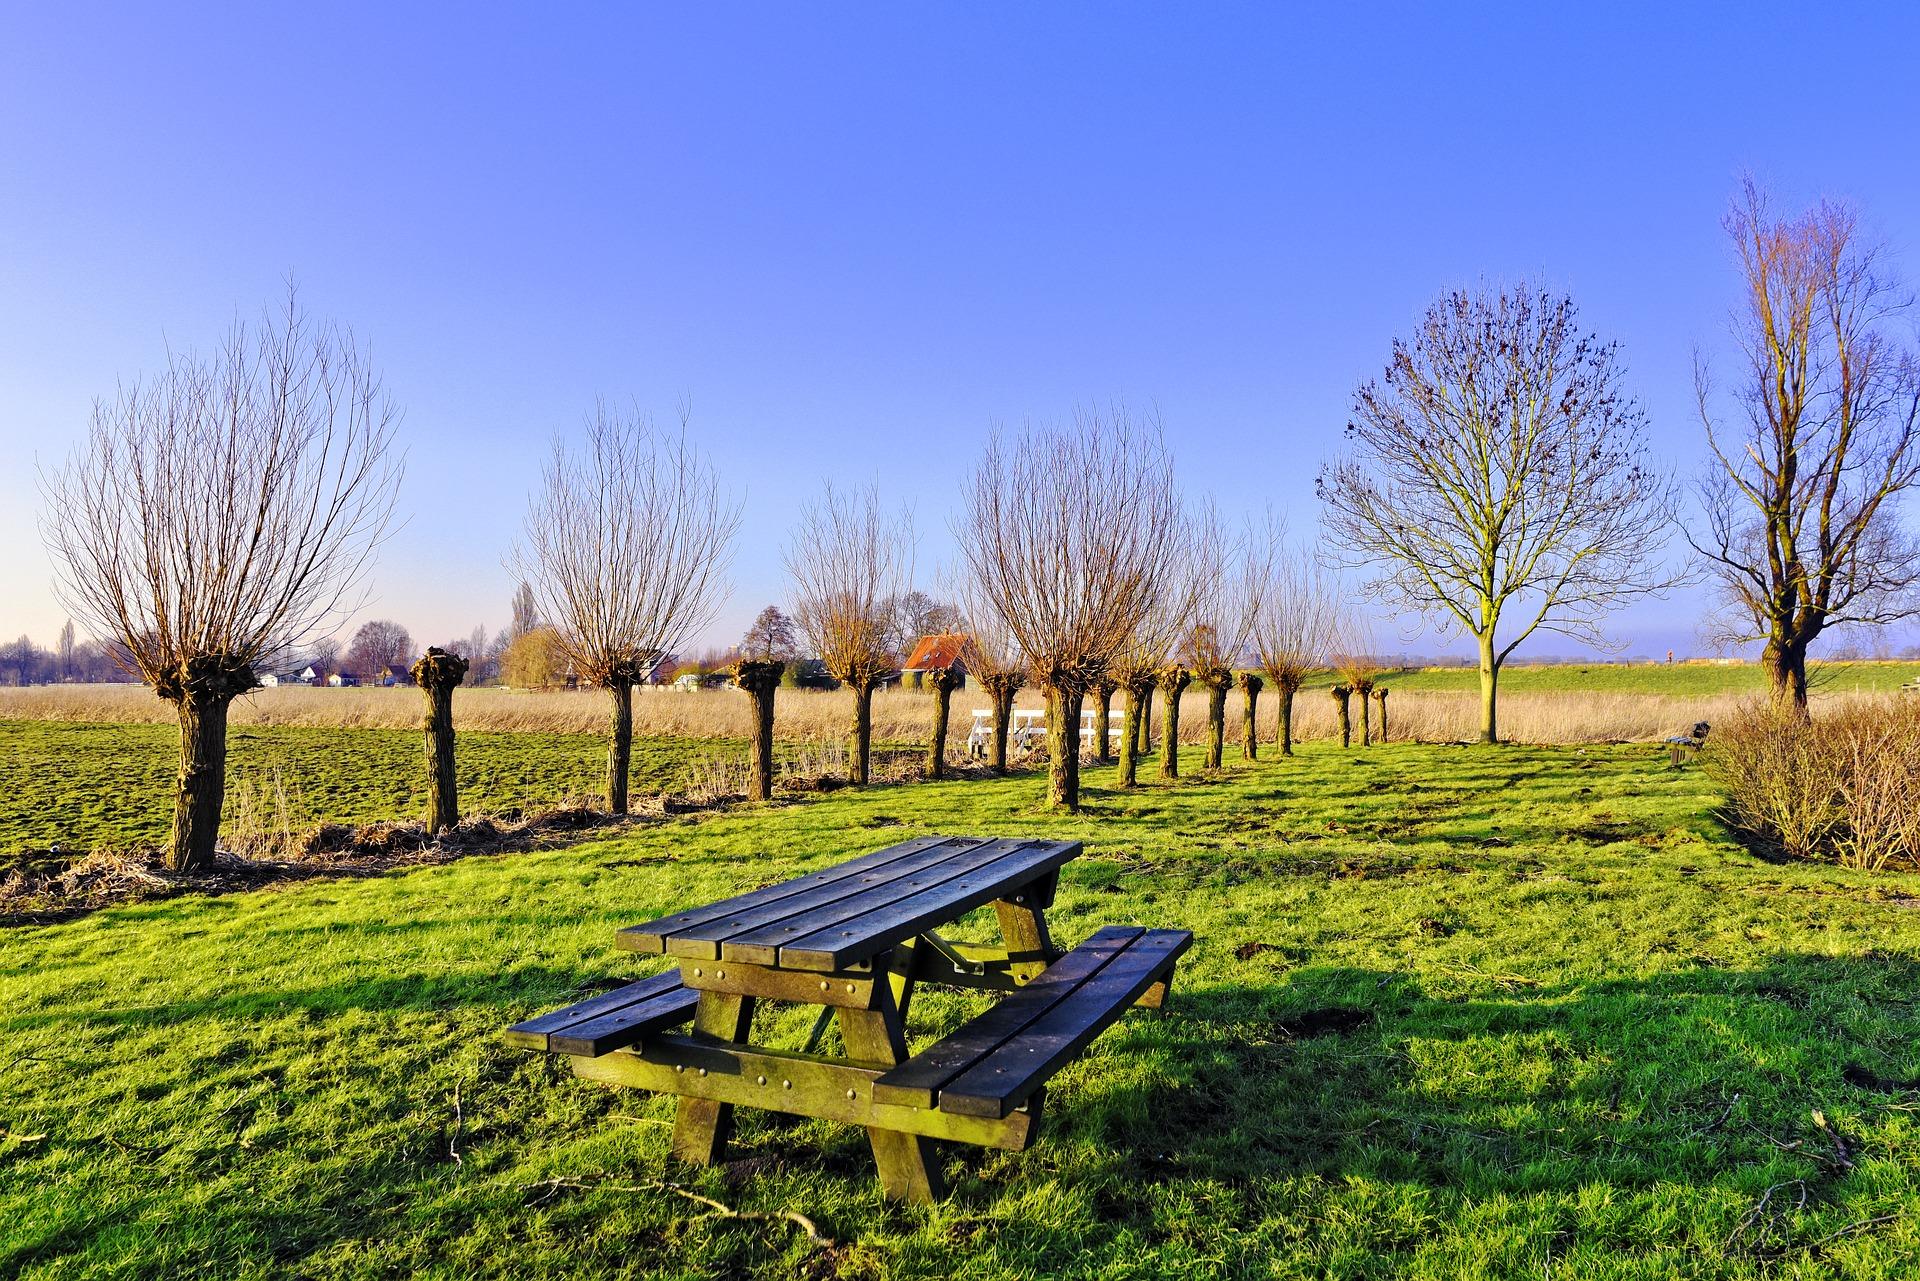 113-picnic-table-3161328_1920_arbre tetard